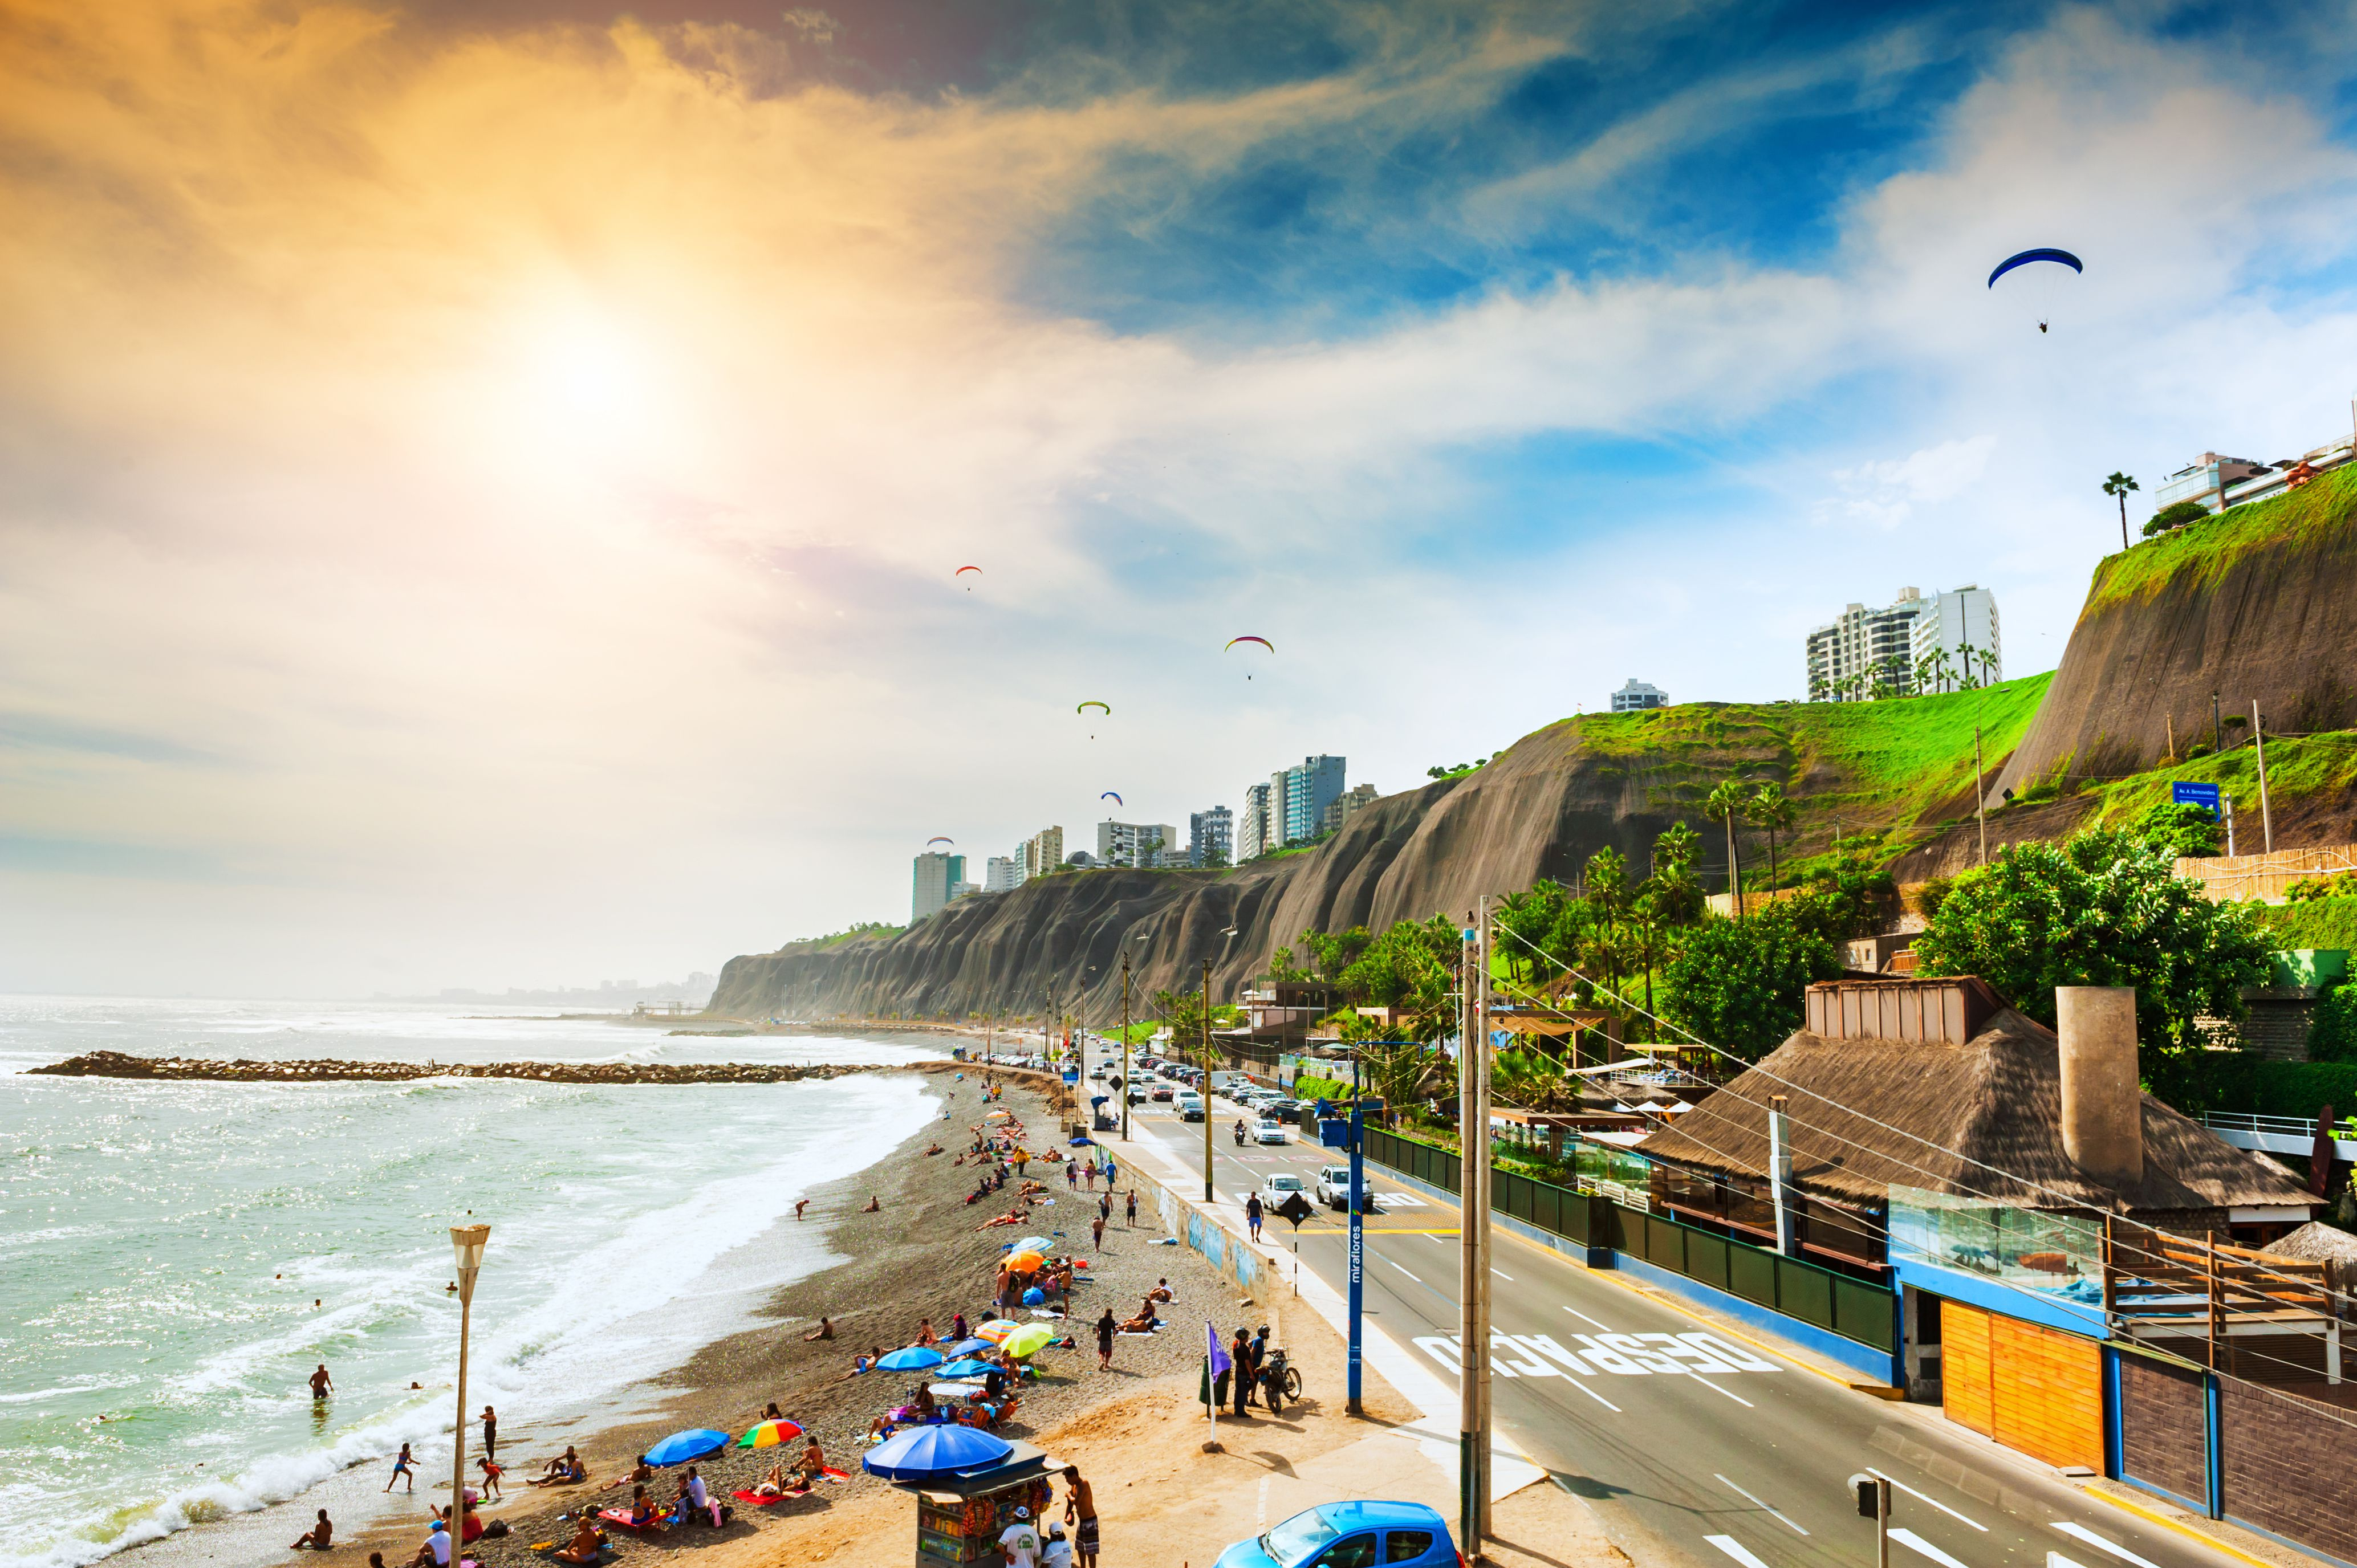 Beautiful coast of Pasific ocean in Miraflores district in Lima, Peru